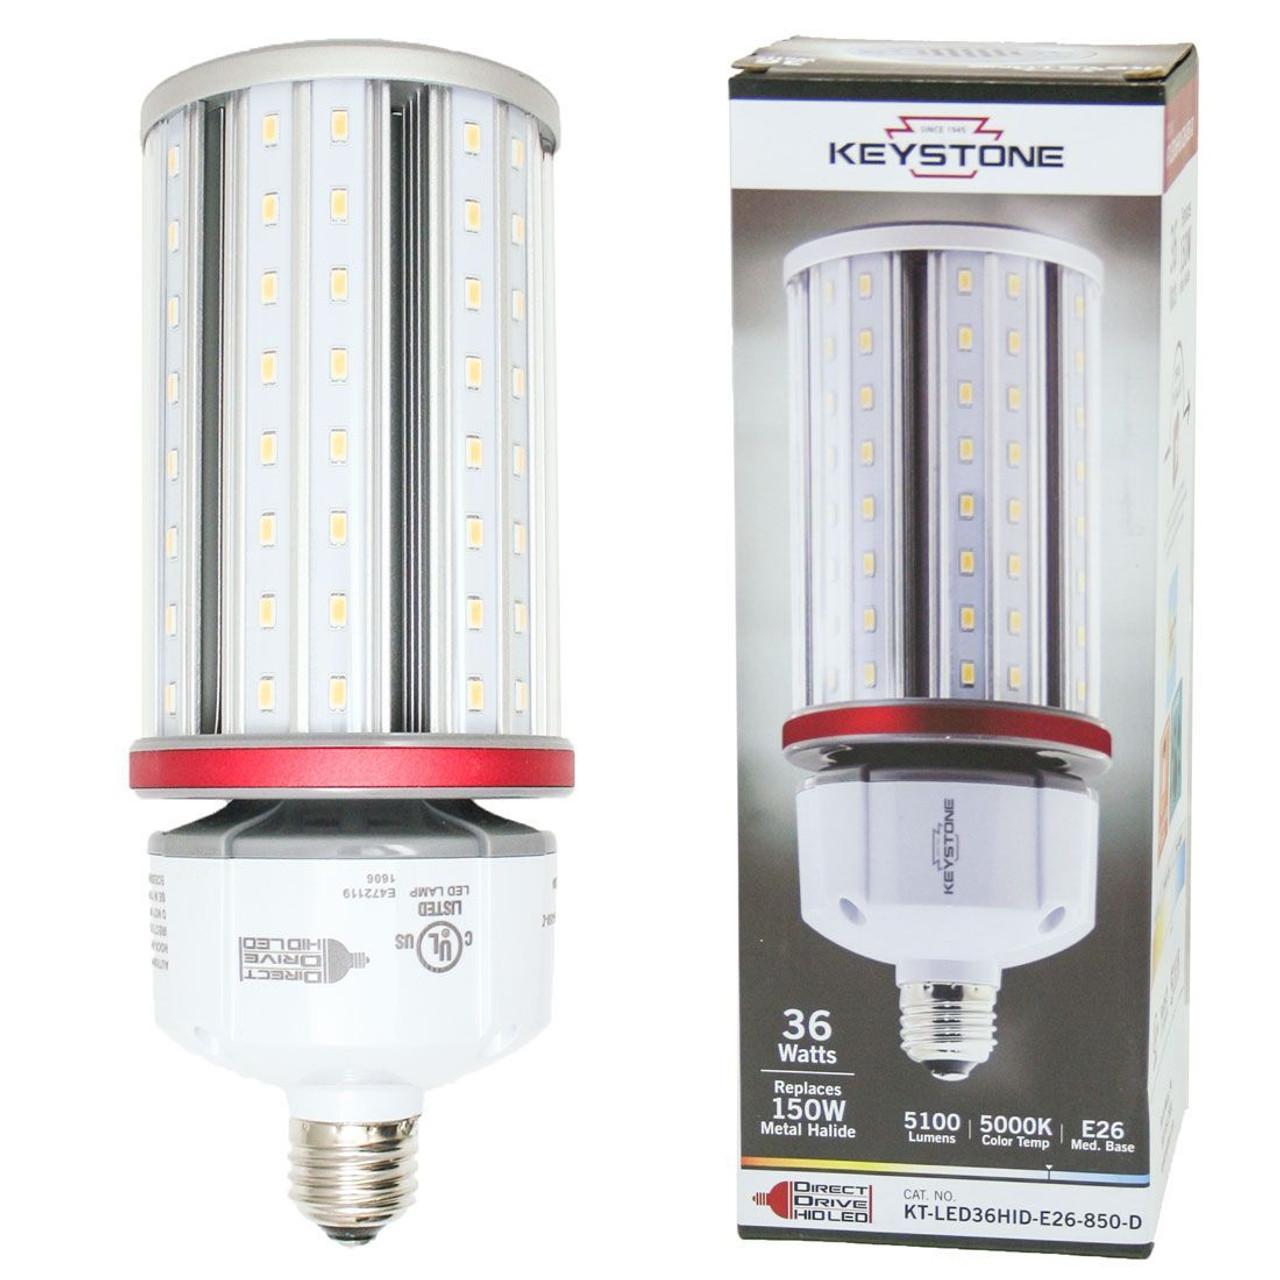 Keystone Kt Led36hid E26 850 D 150w Metal Halide Equal Led Corn Bulb Light Bulb Surplus